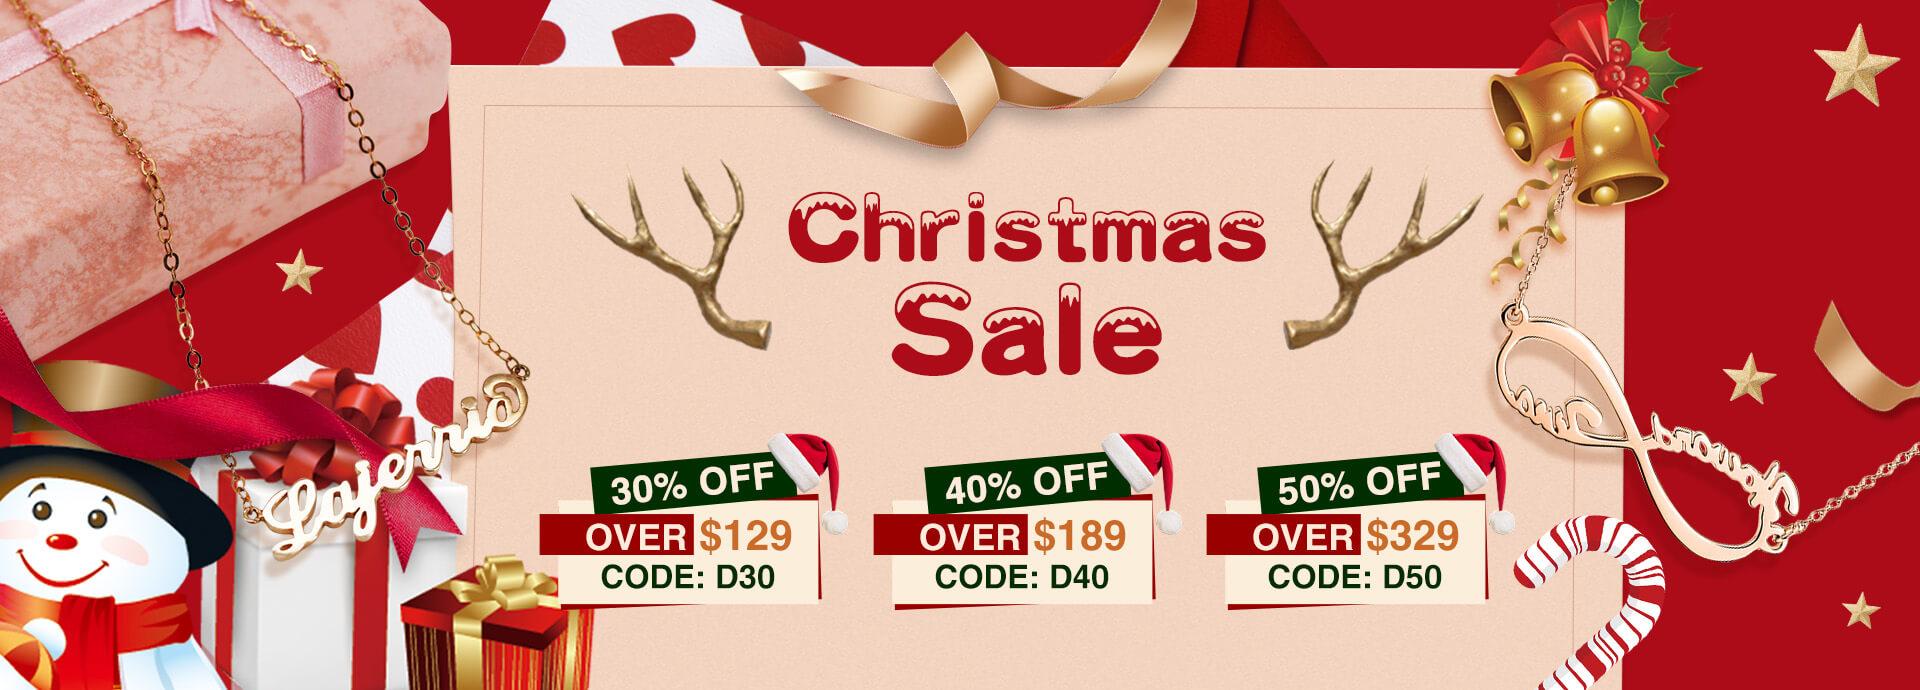 Lajerrio Christmas Sale